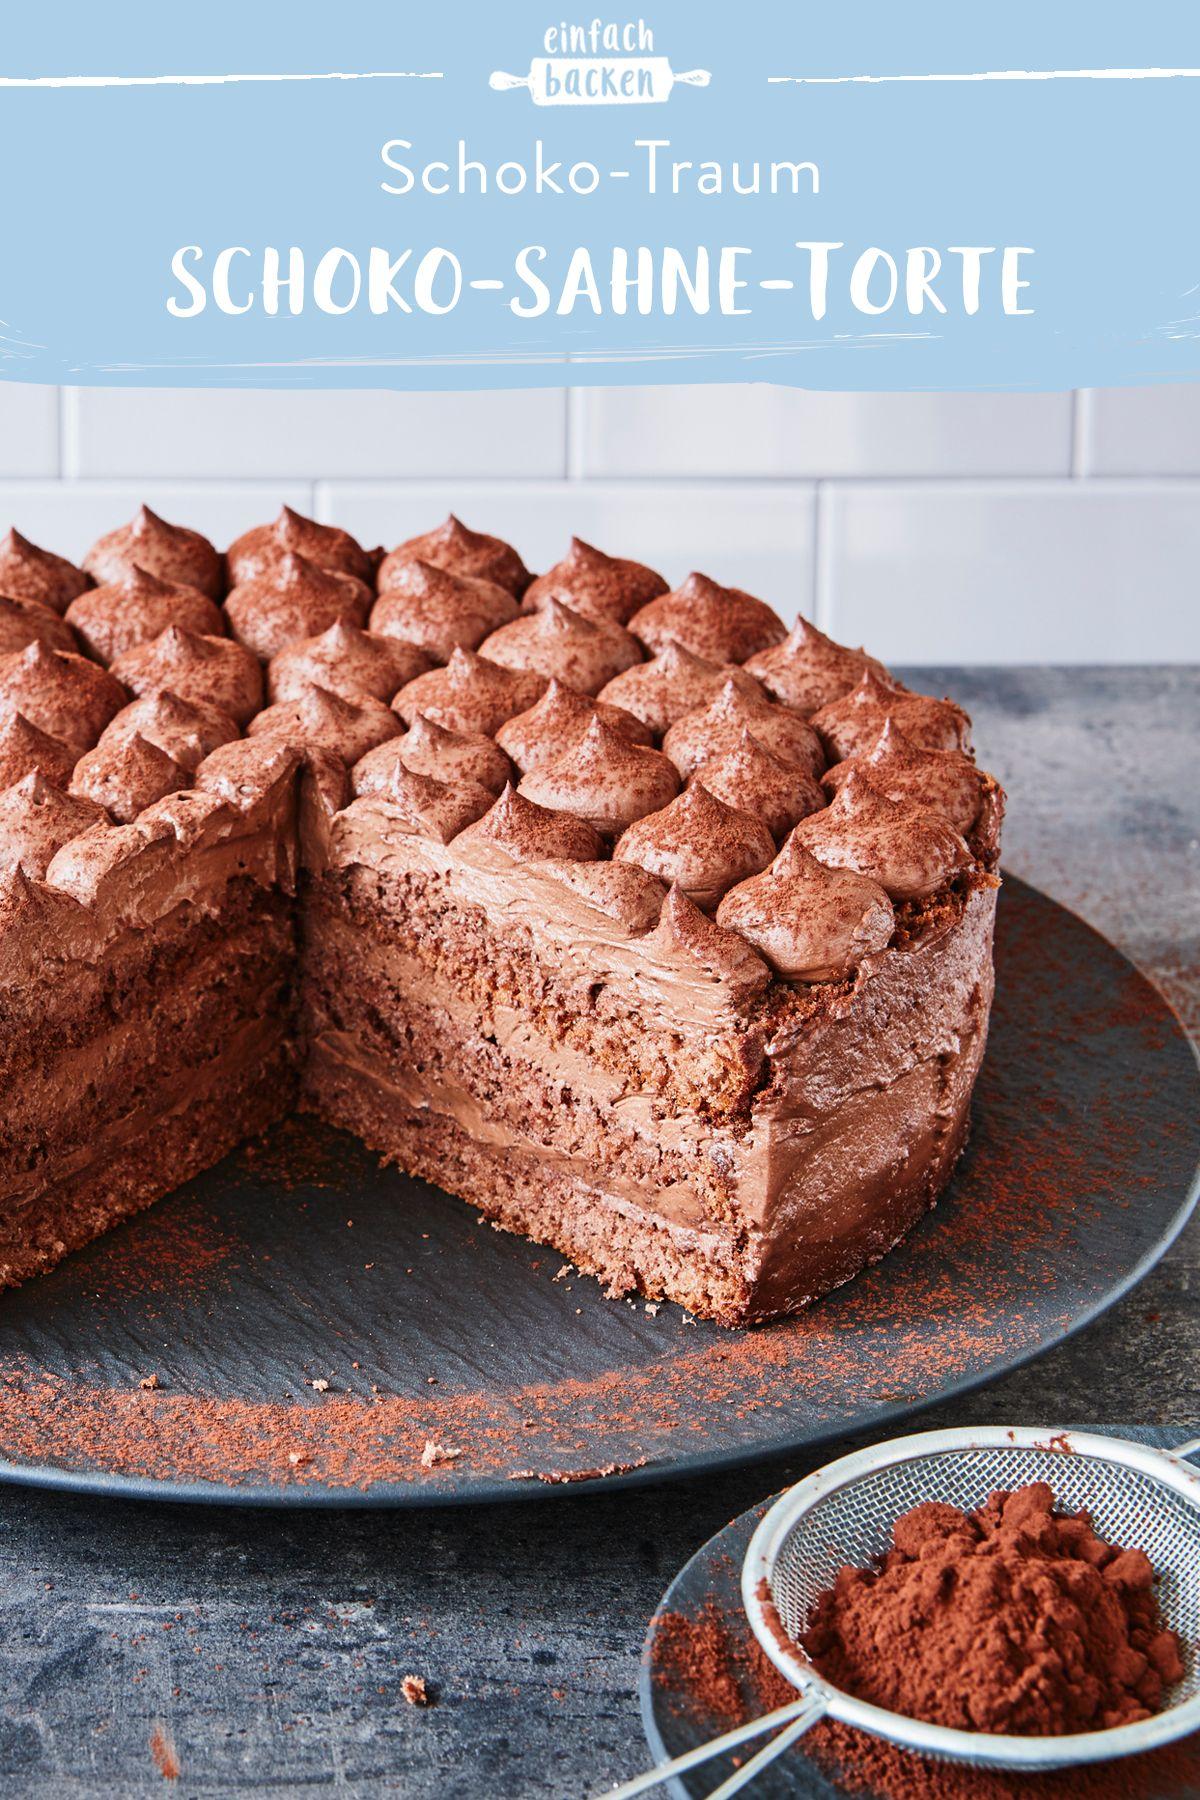 Schoko Sahne Torte Rezept In 2020 Schoko Sahne Torte Schoko Muffins Backen Und Schokoladencreme Fur Torte